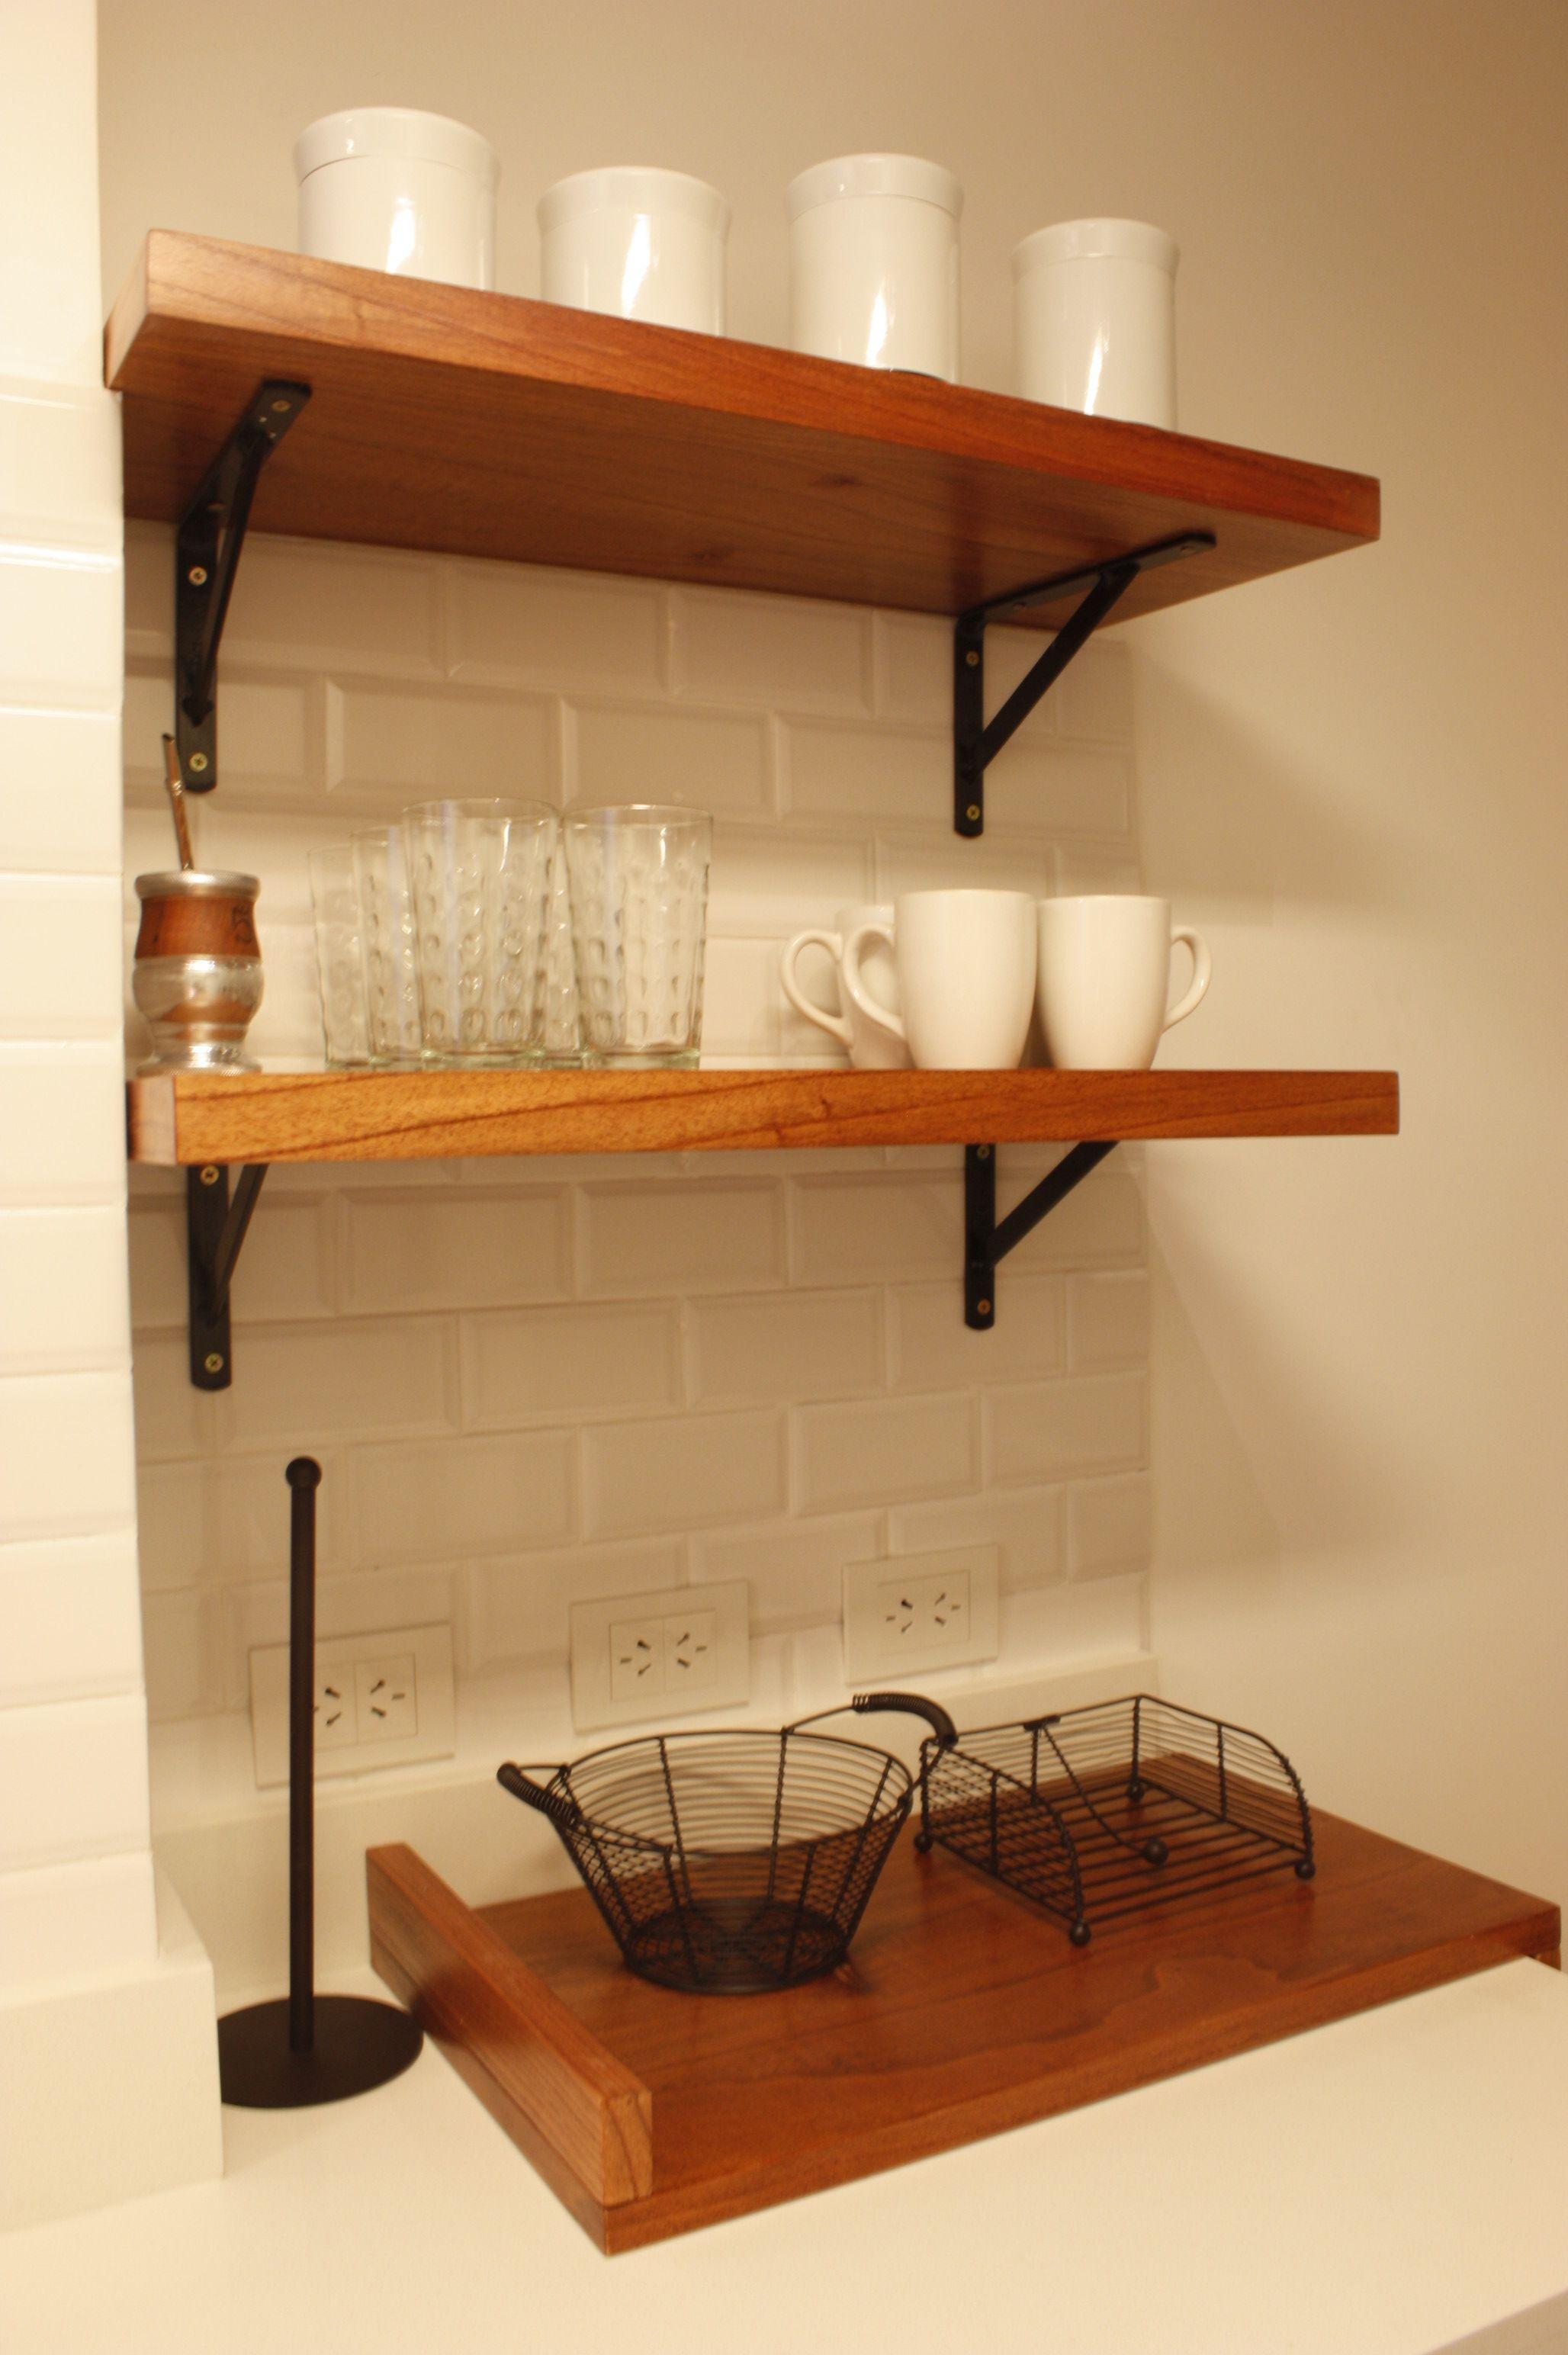 detalle en madera para estantes con ménsulas de hierro antiguo sobre ...